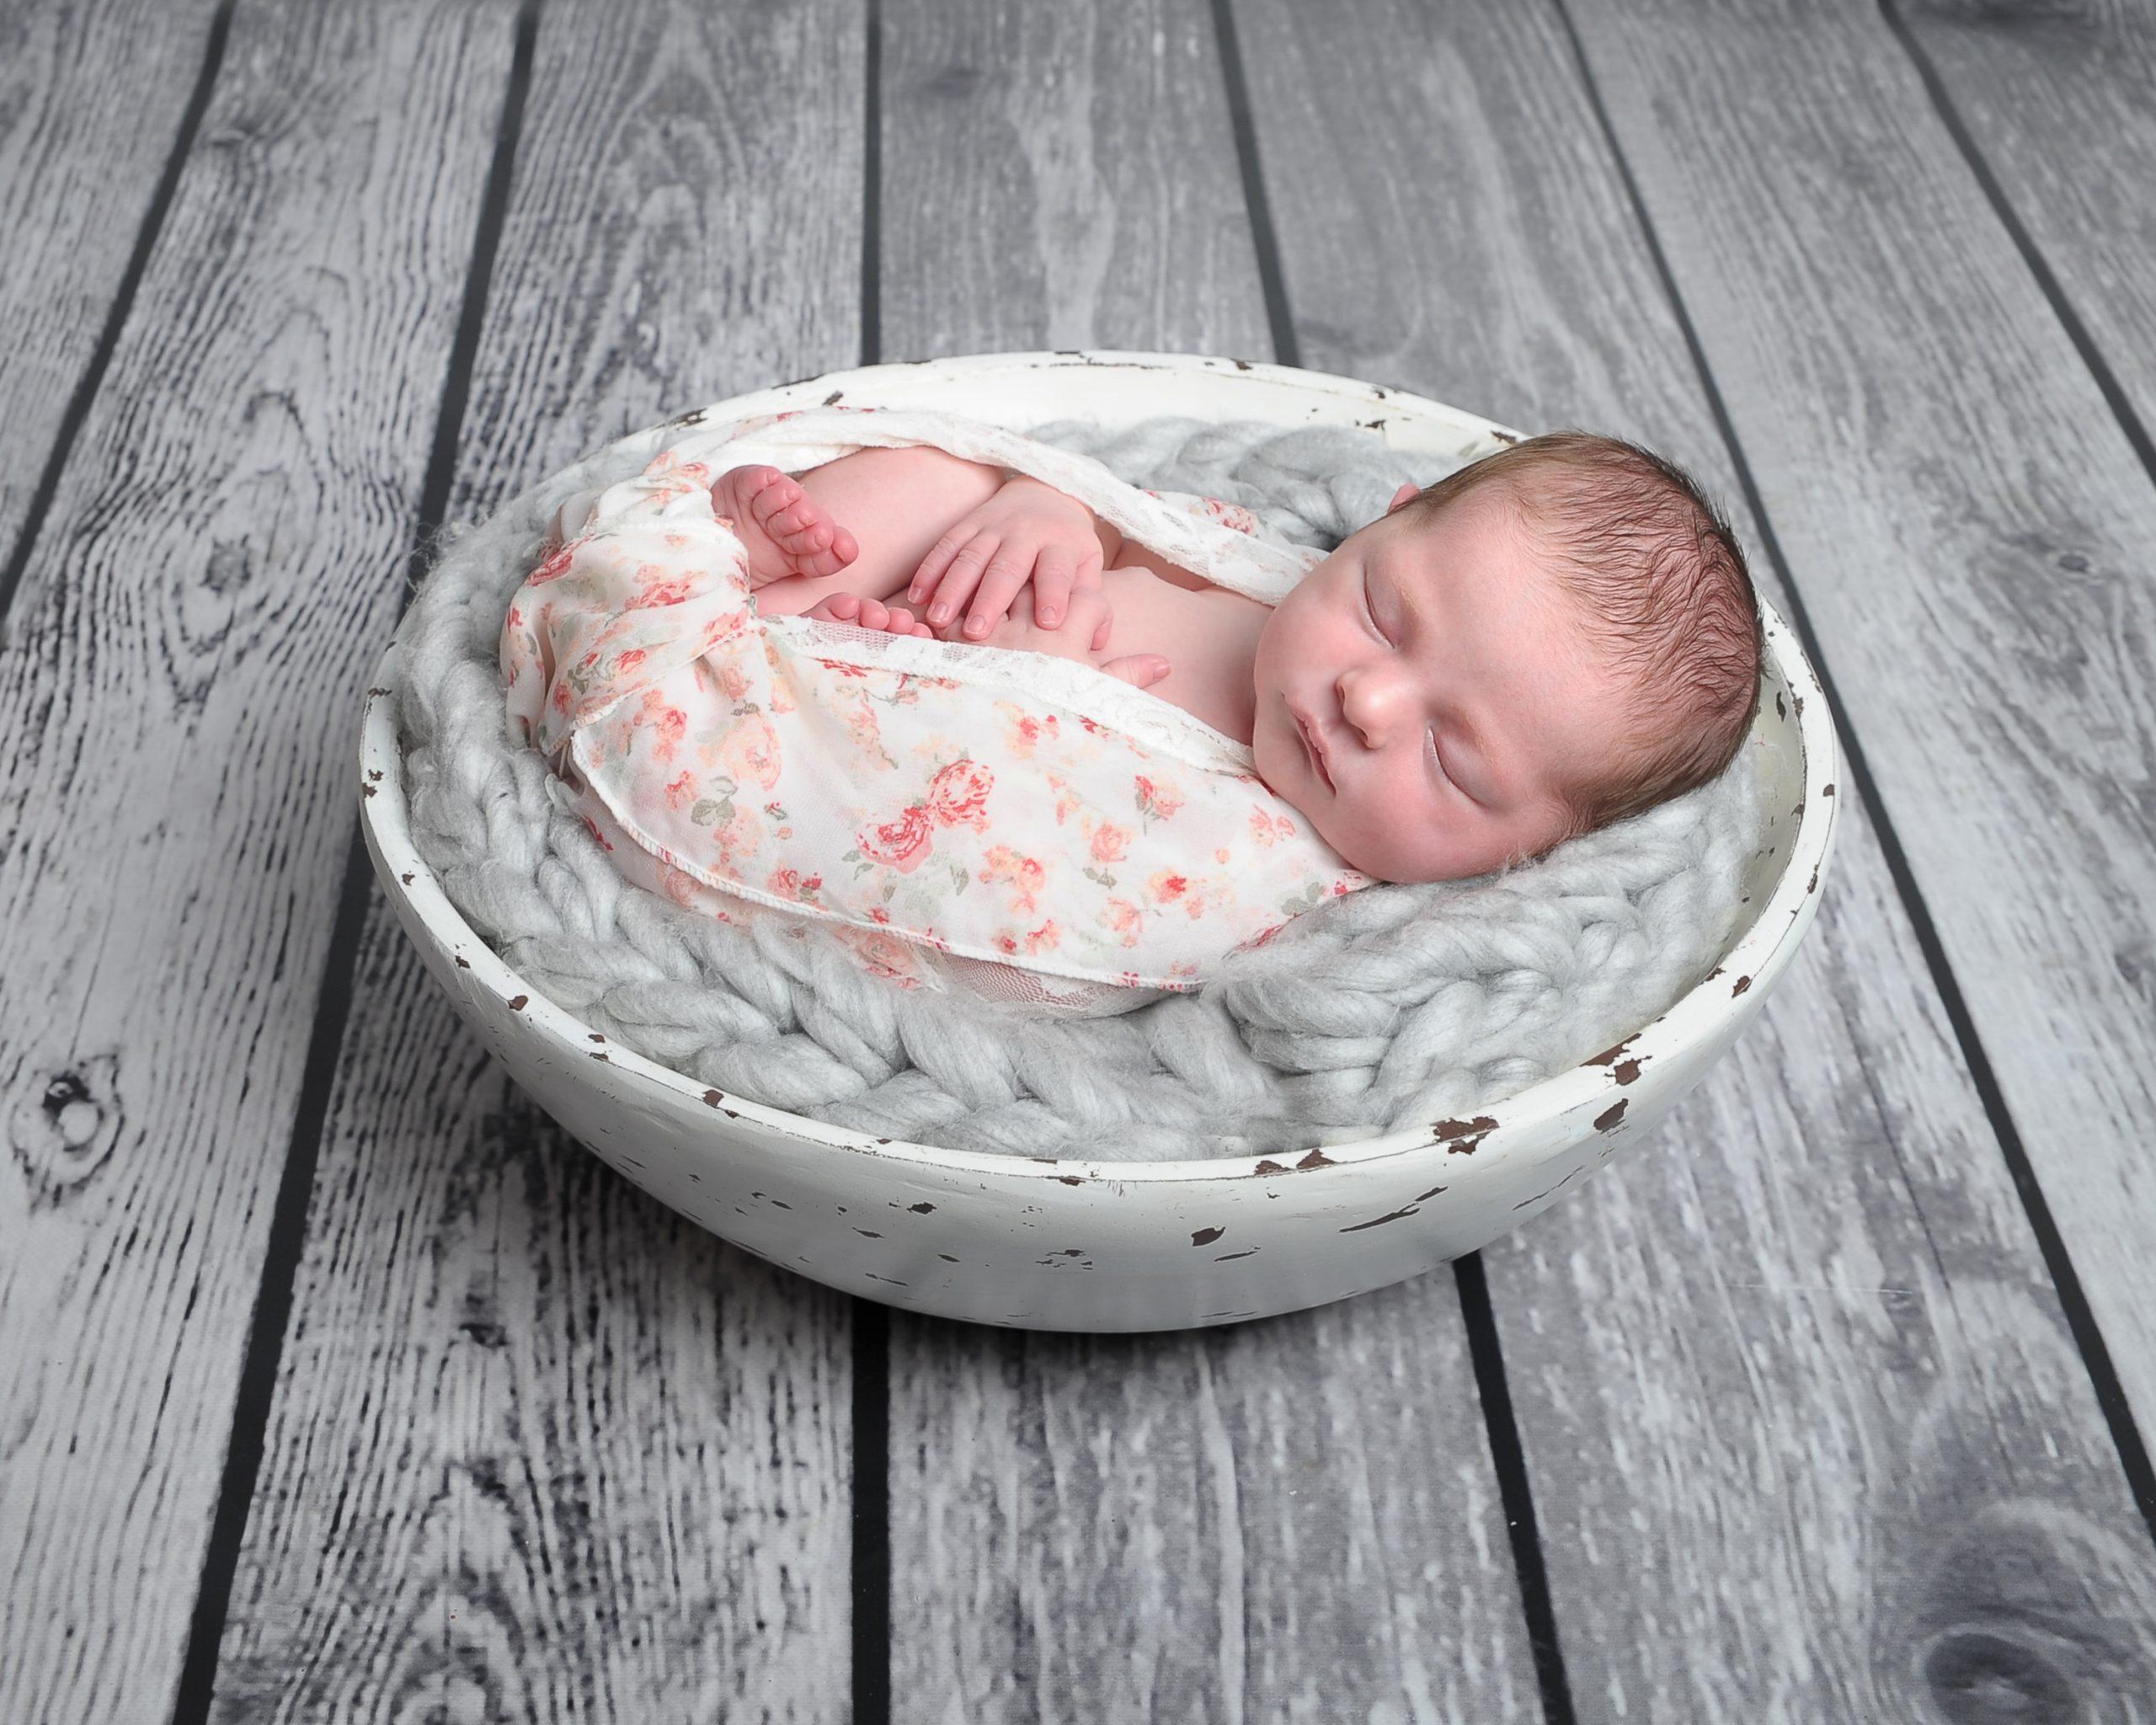 newborn baby girl sleeping in bowl